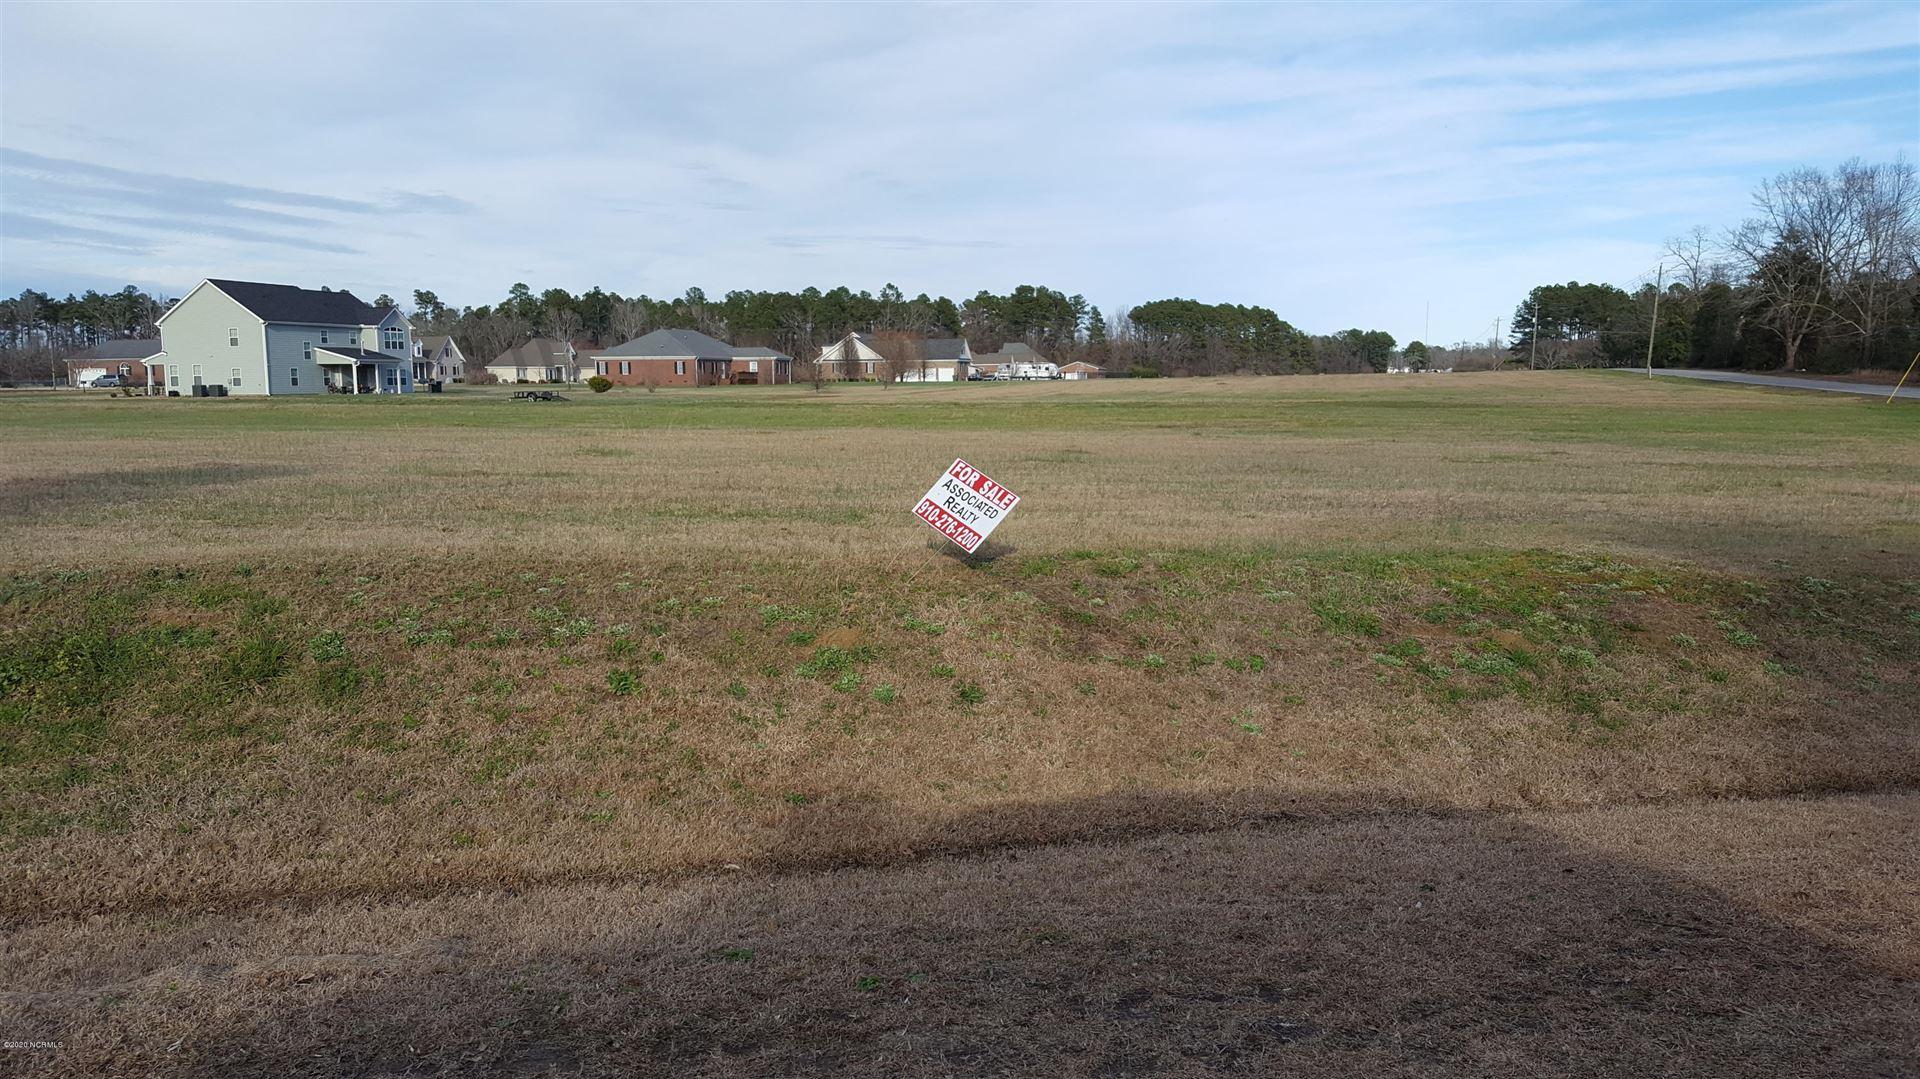 Photo of Tbd #69 Heritage Drive, Laurinburg, NC 28352 (MLS # 100205322)